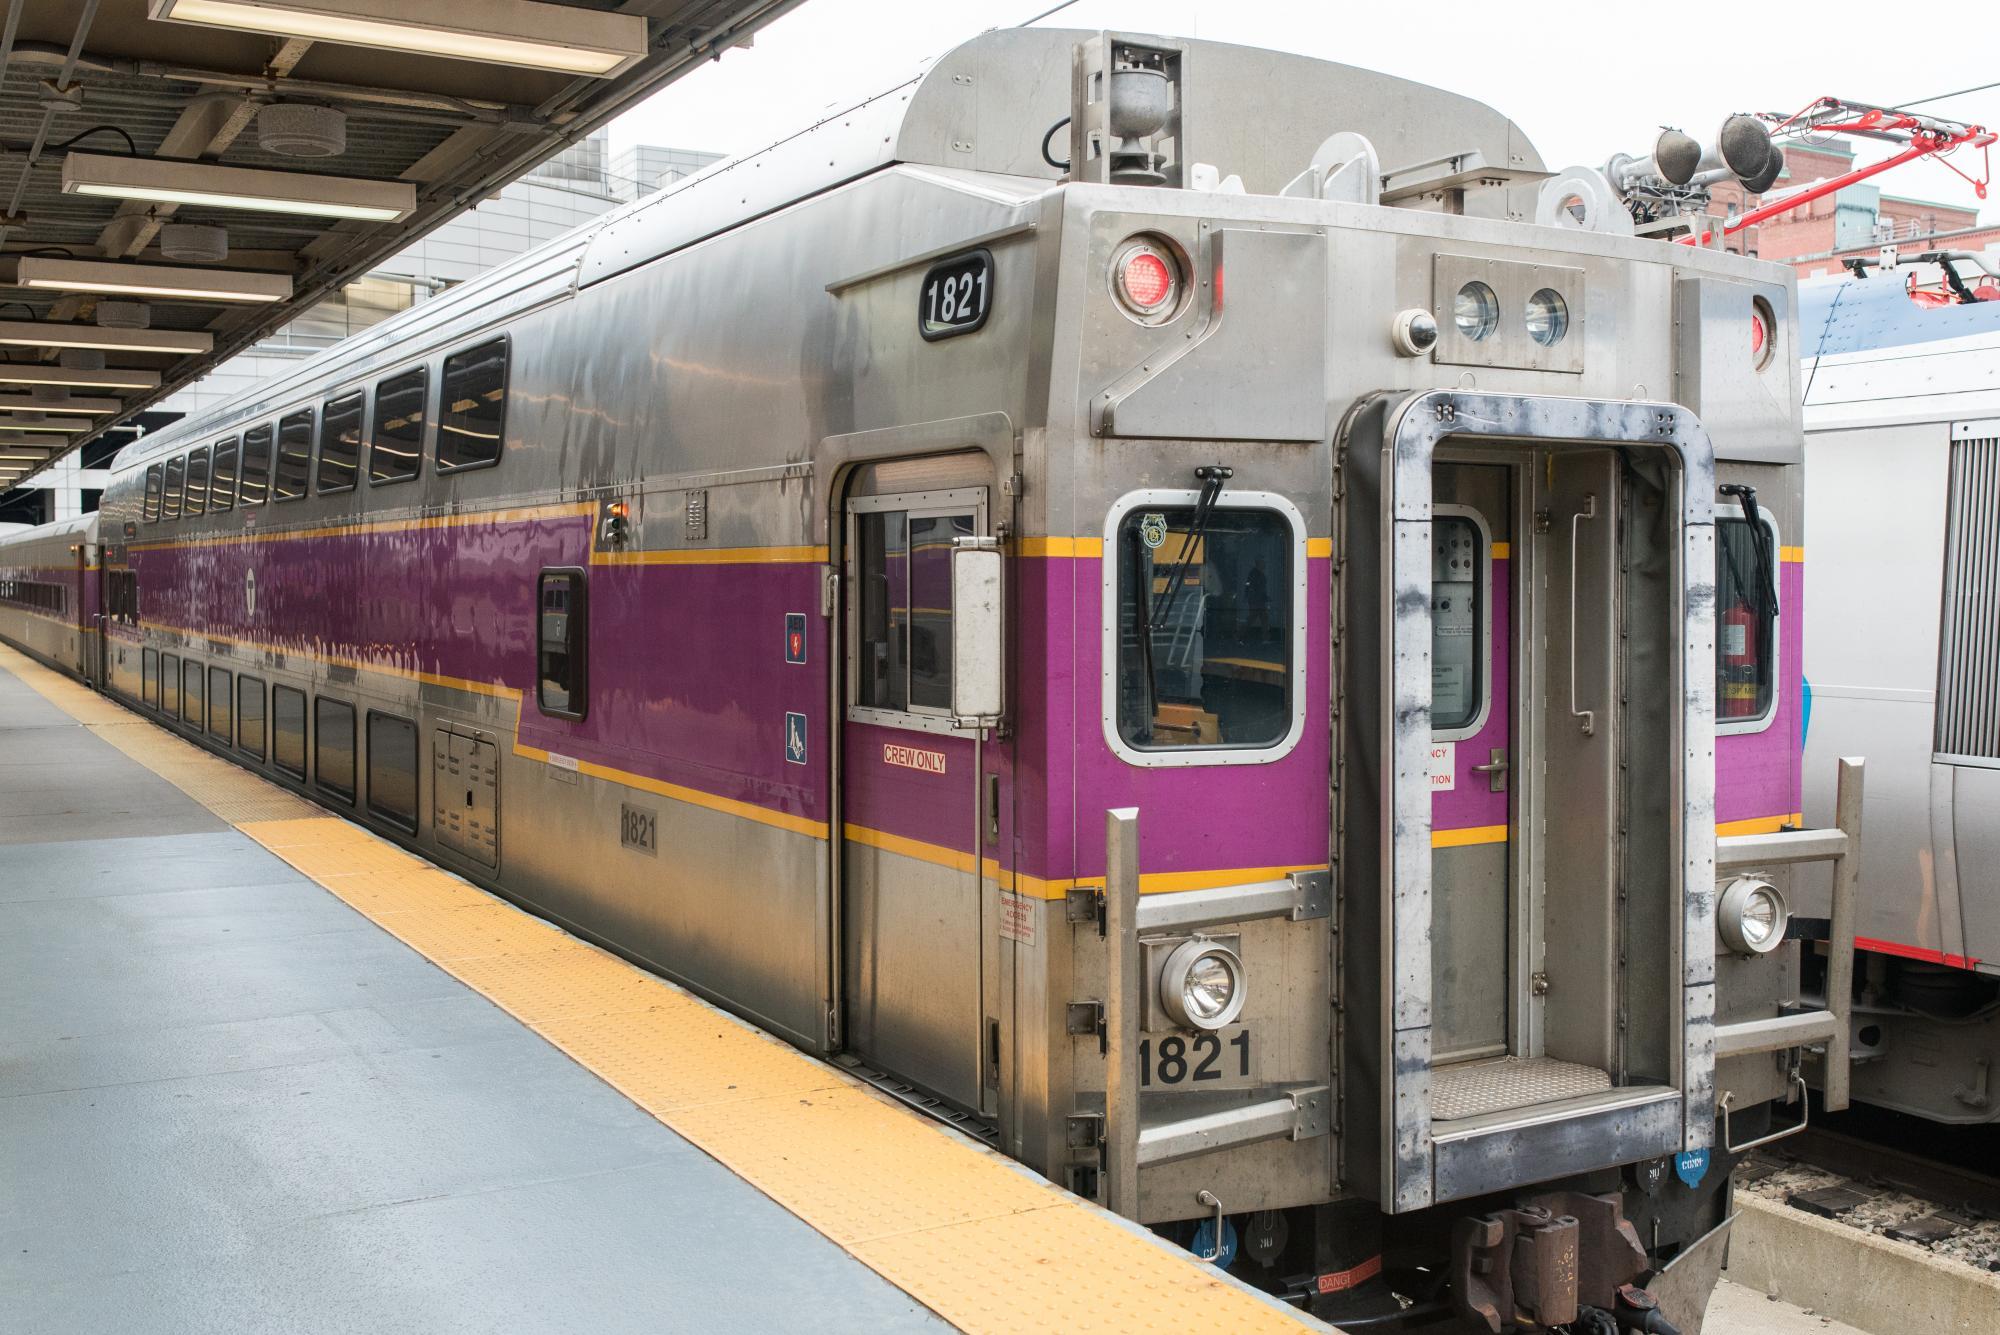 Commuter rail train at a station platform.